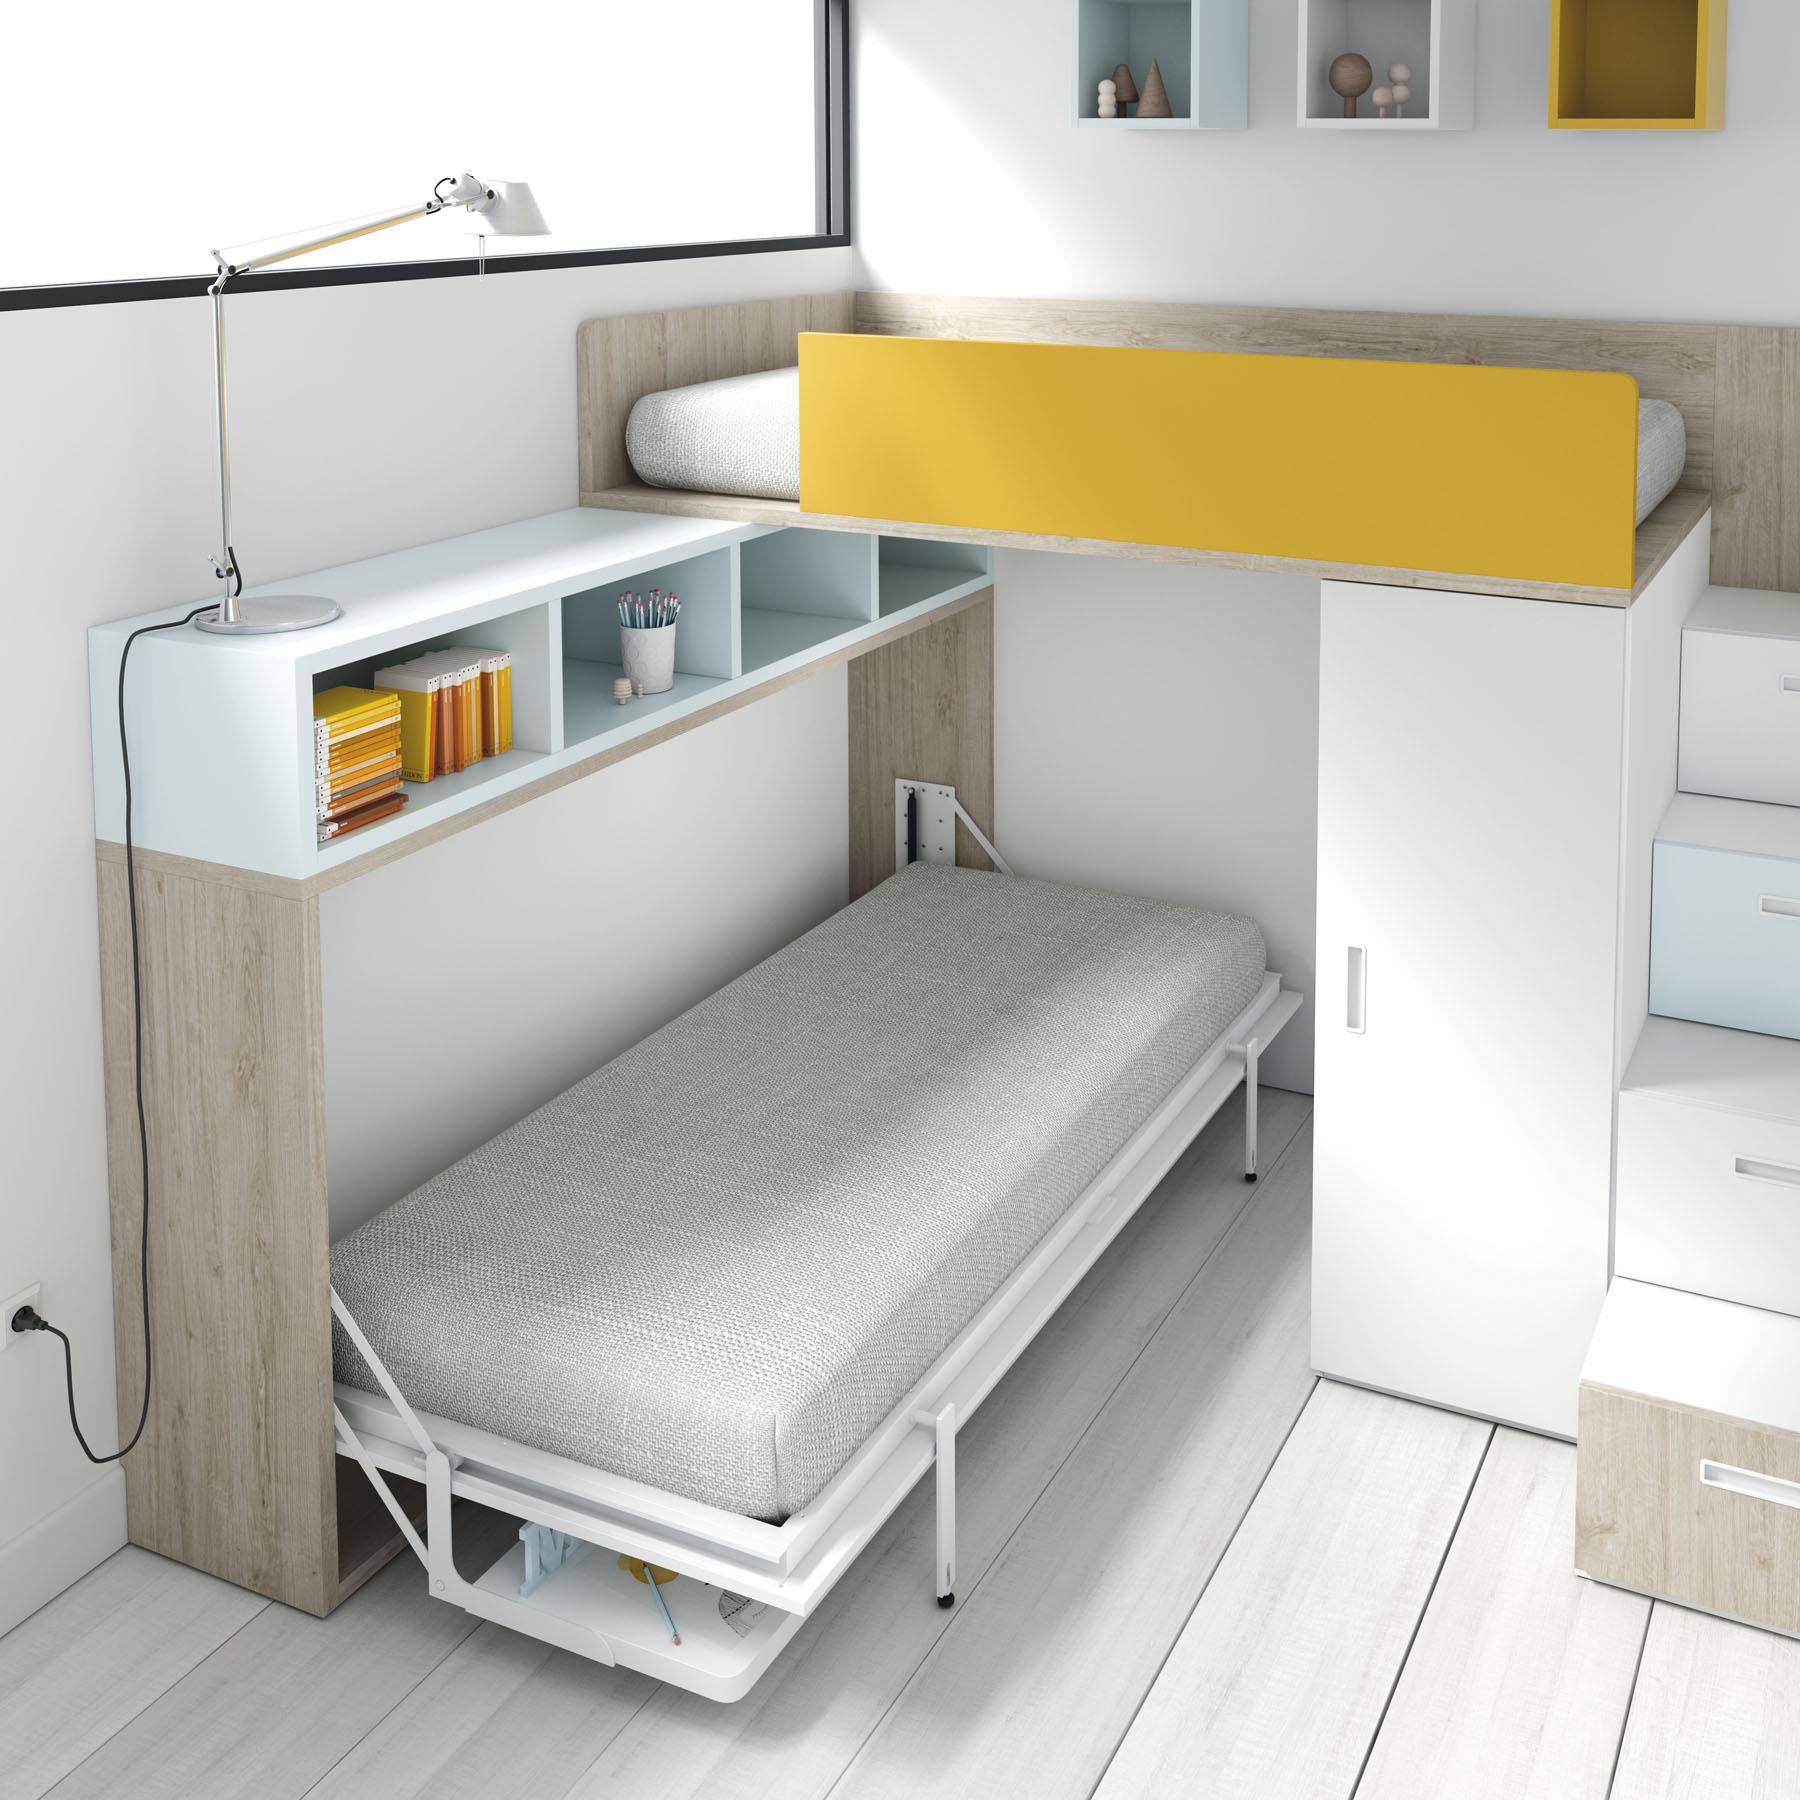 Sistemas abatibles qb tegar - Sistema cama abatible ...